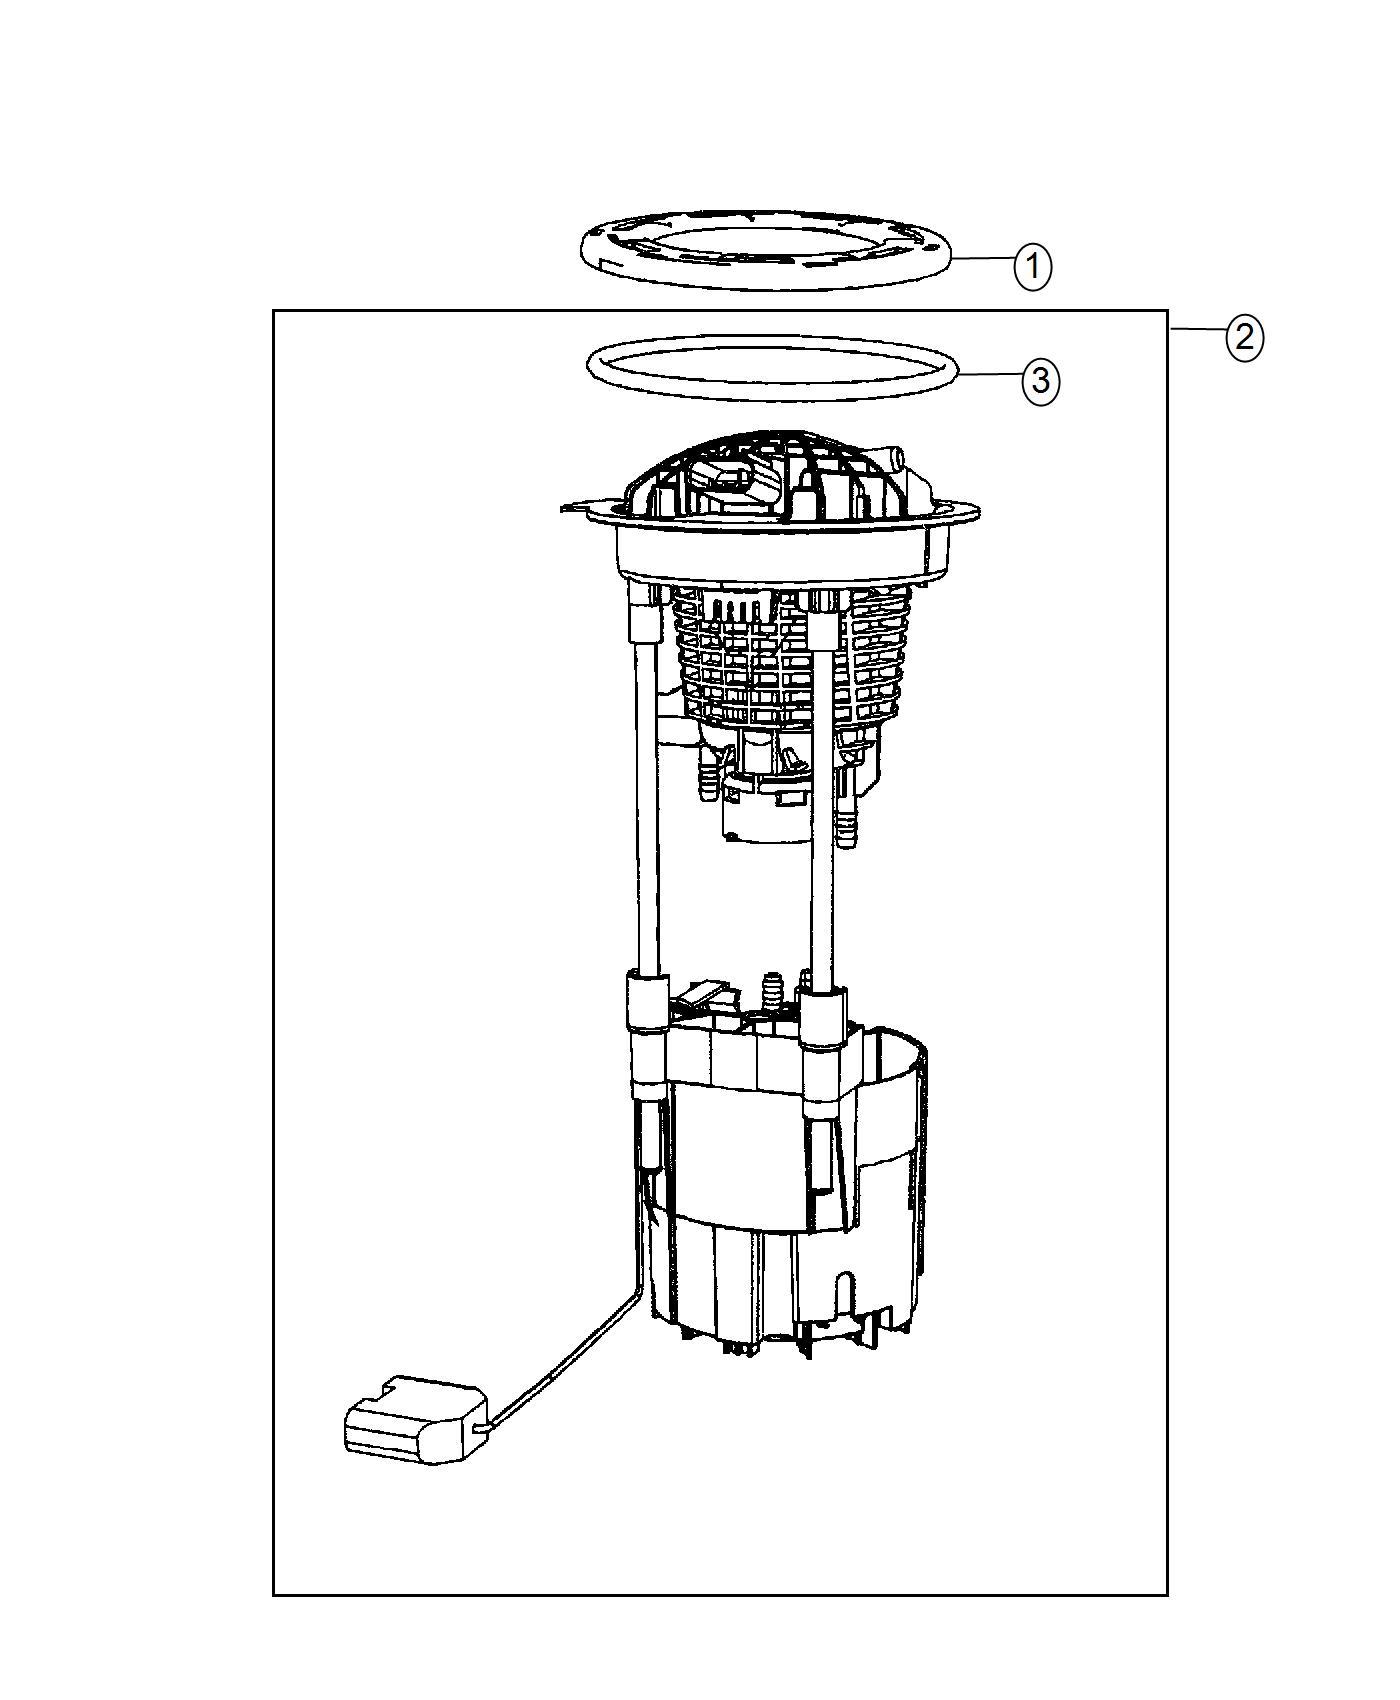 Ram Module Kit Fuel Pump Level Unit Tank Gallon